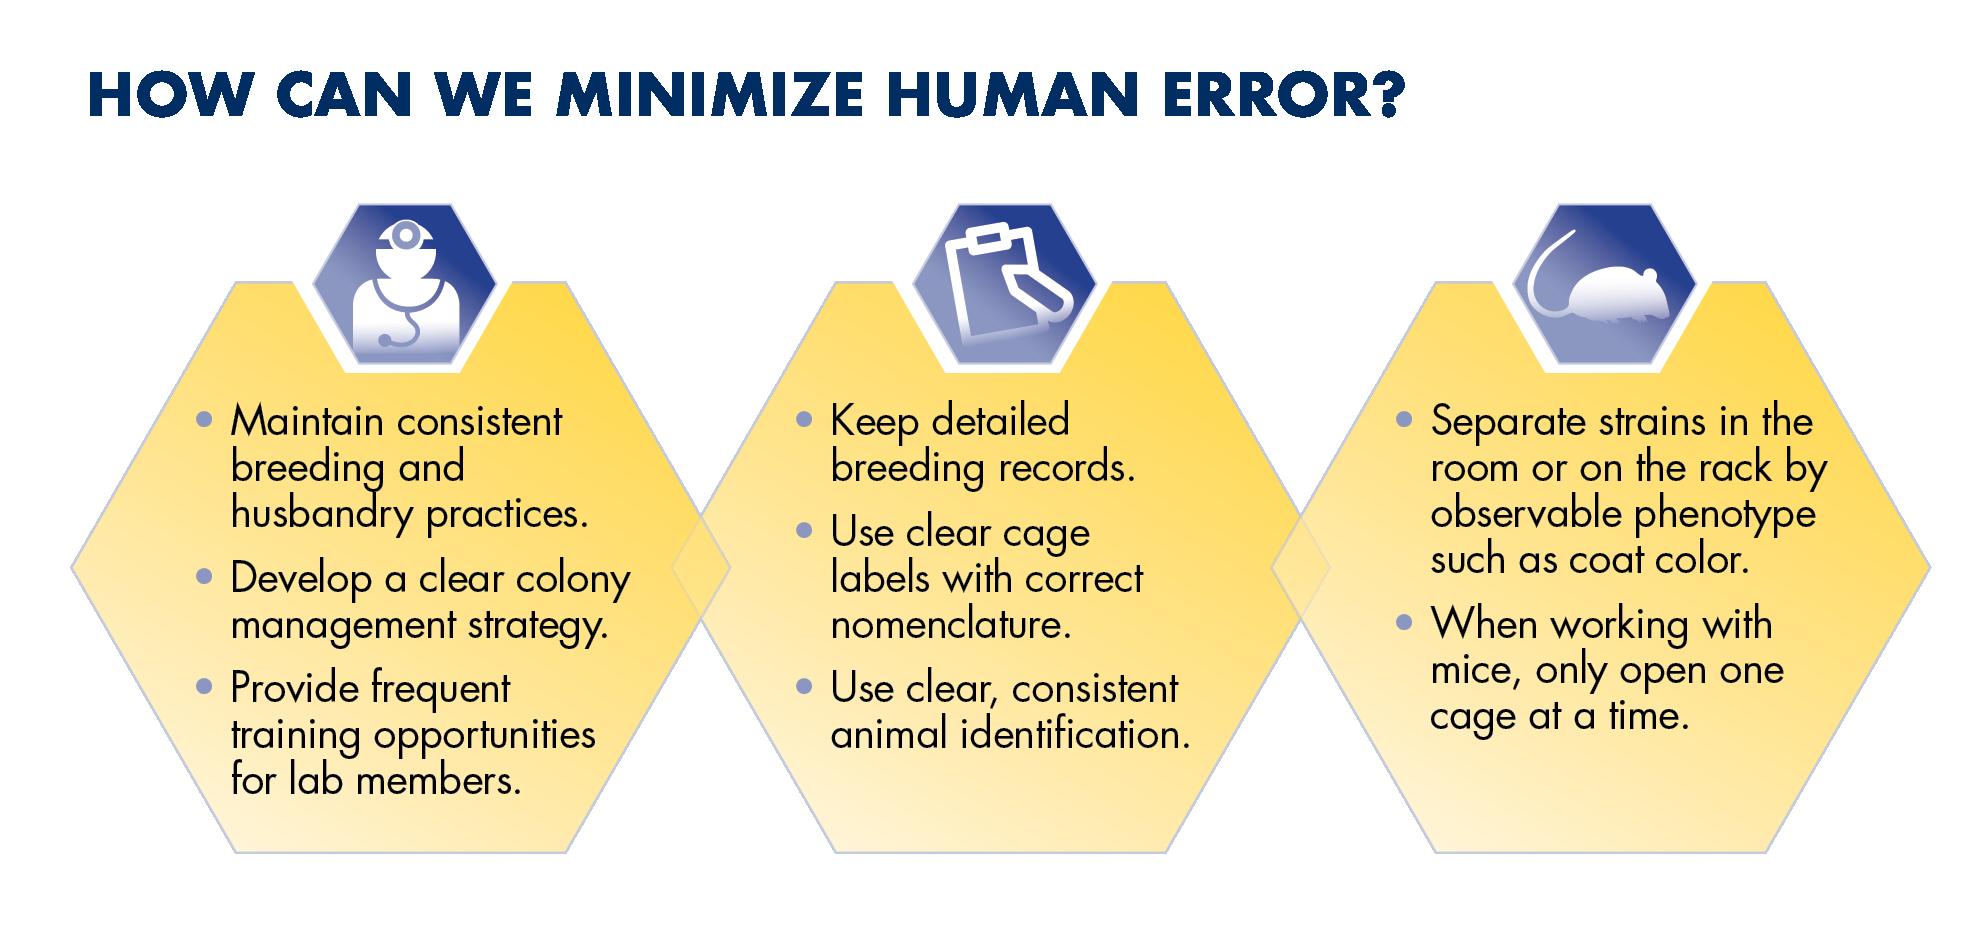 Three hexagon icons that explain how human error can be minimized through proper genetic quality controls